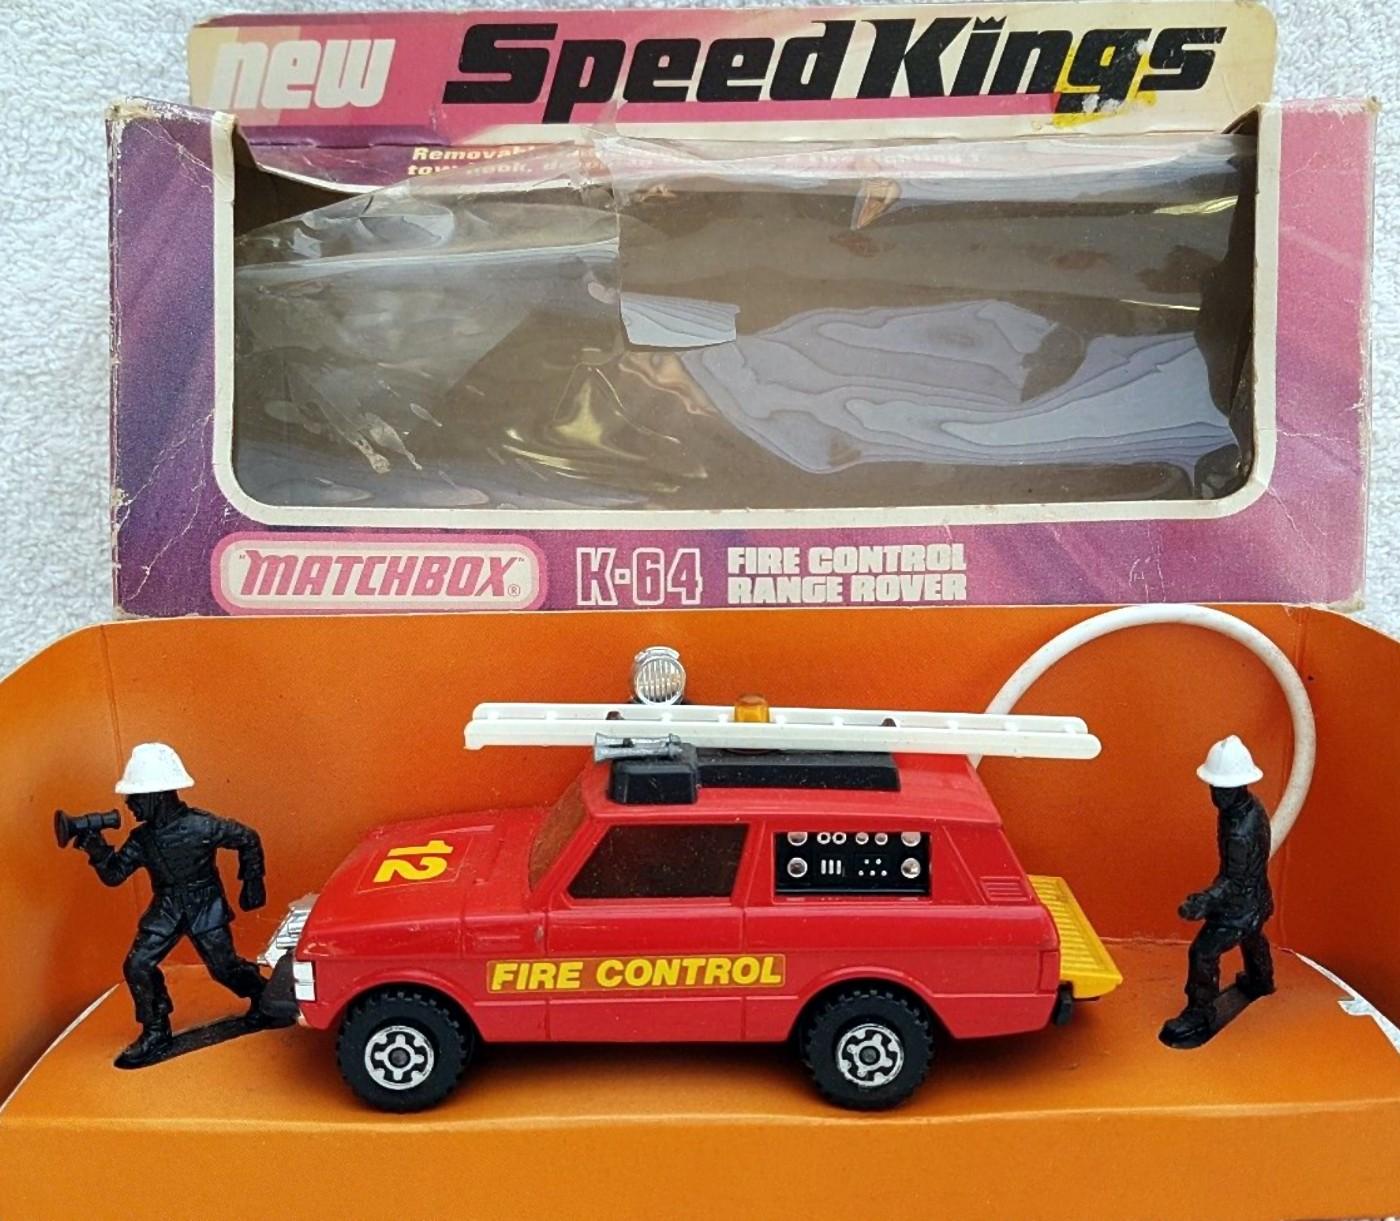 Range Rover Fire Control (K-64)